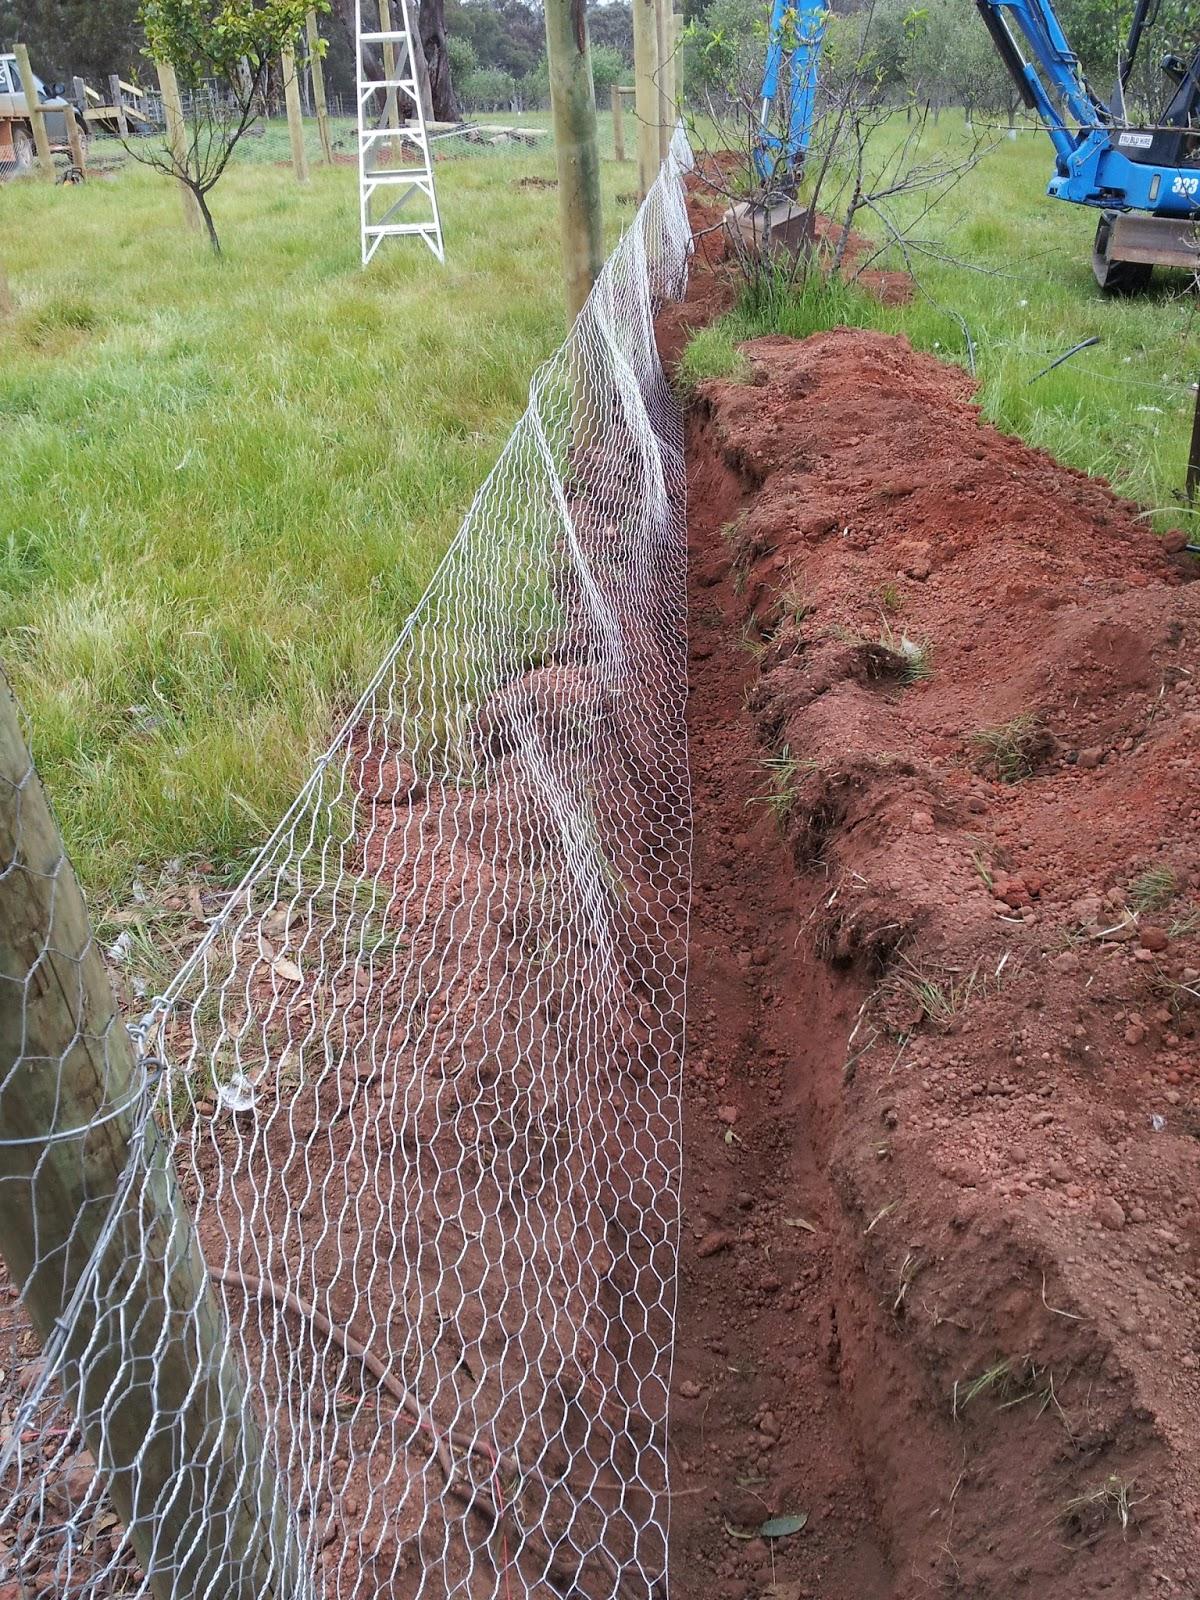 Pretending to Farm: Building a Fox Proof Chicken Coop